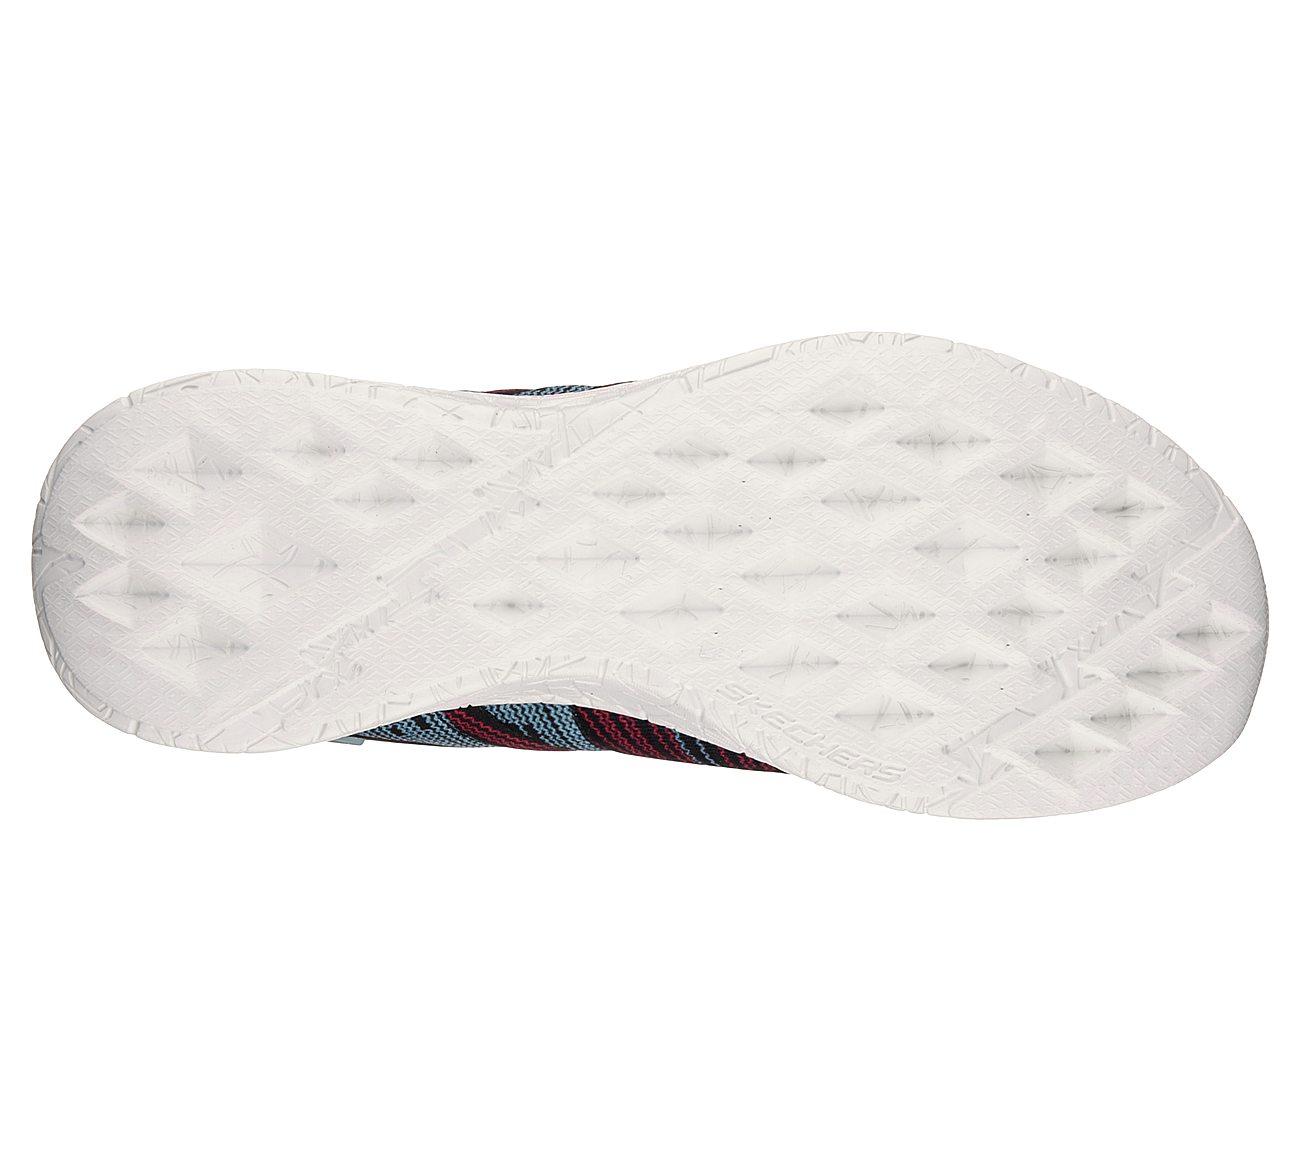 7fe7ac51dd49 Buy SKECHERS Burst 2.0 Sport Shoes only  75.00